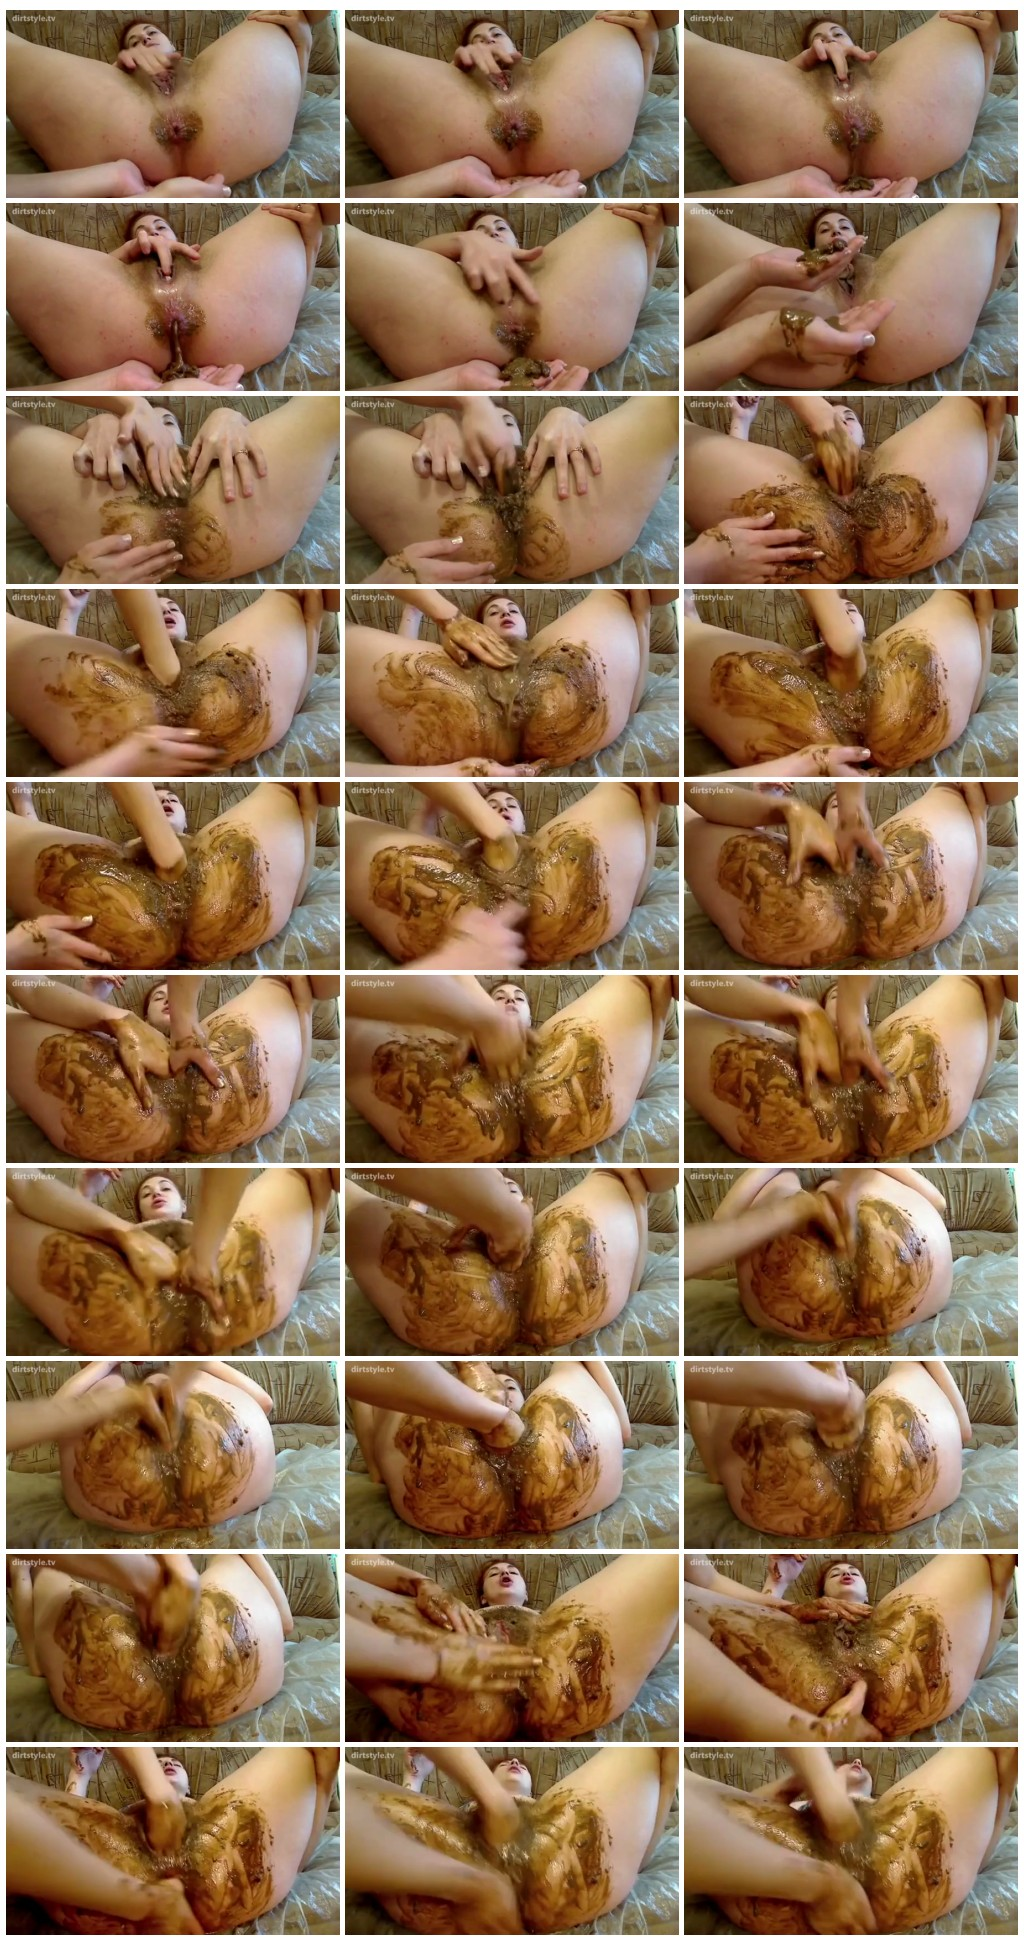 Homemade Scat Video - Lesbian Anal Love 2